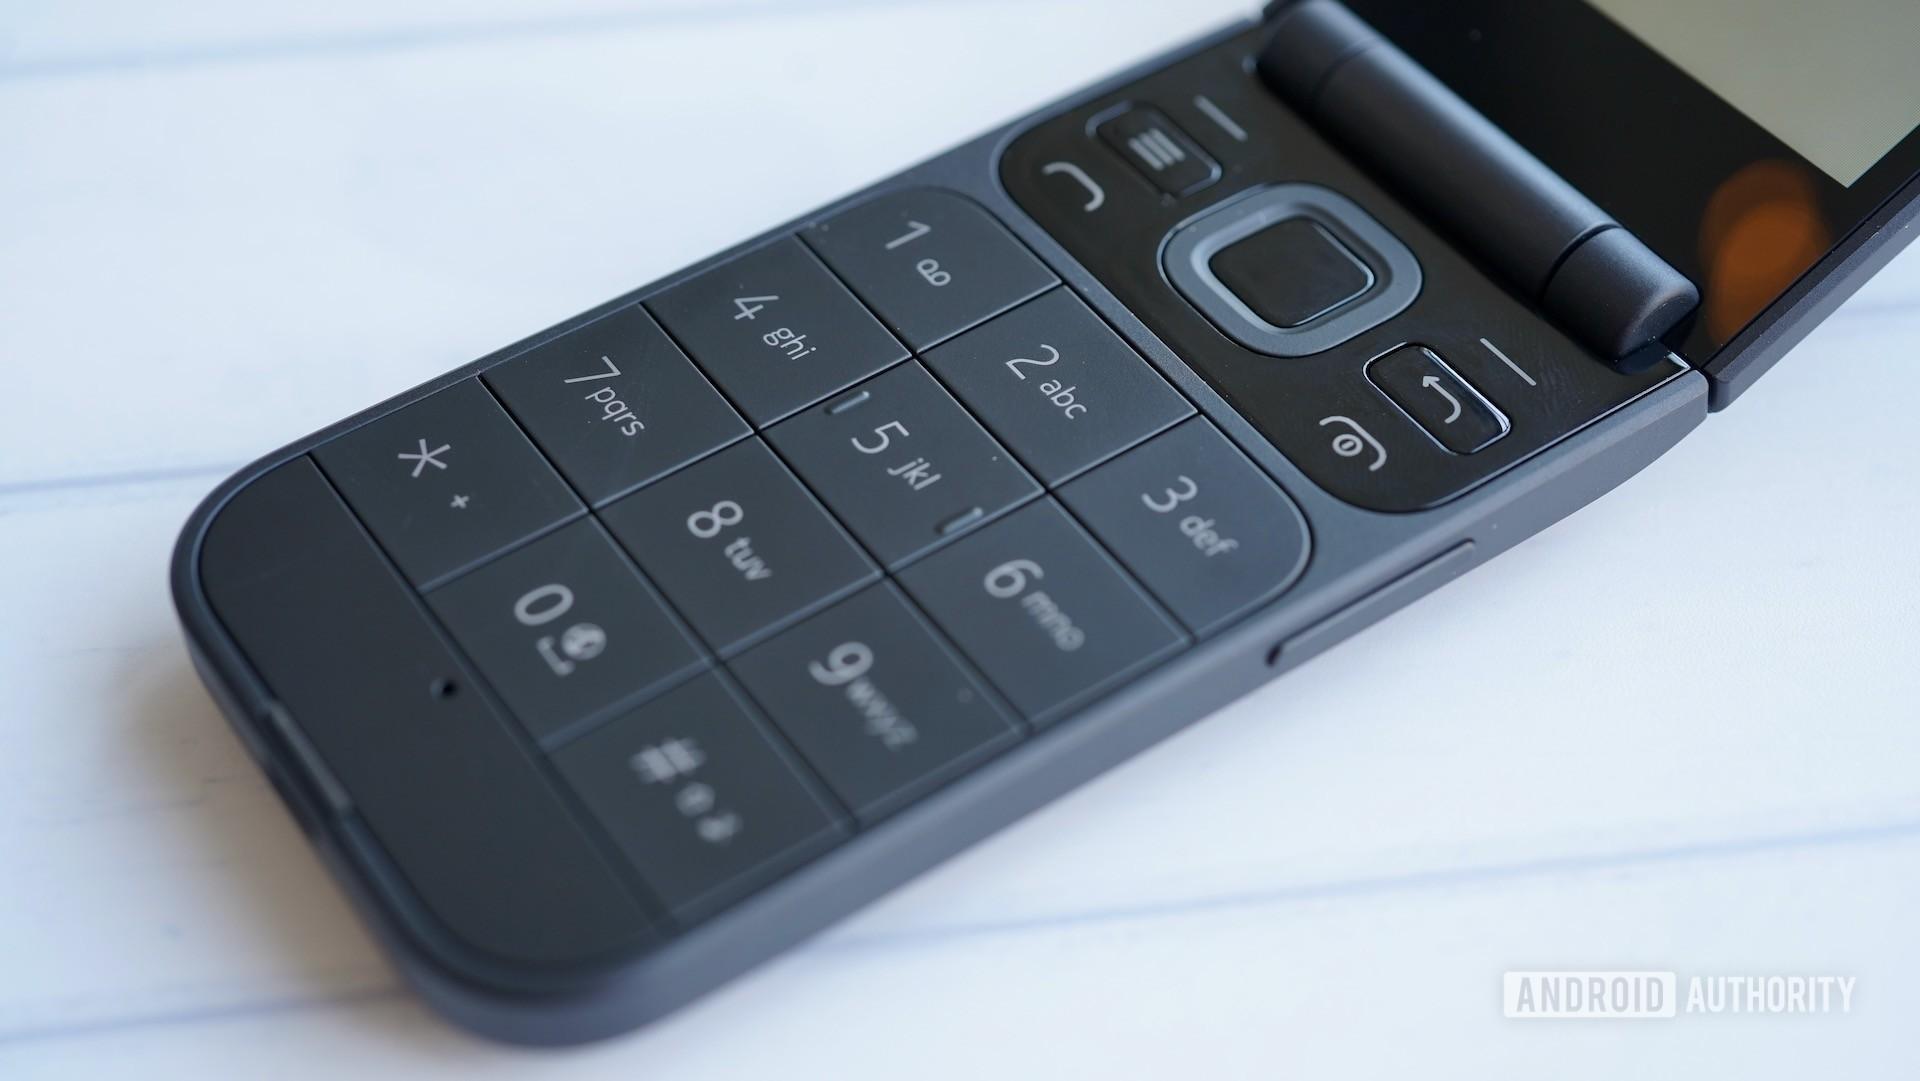 Nokia 2720 hardware buttons